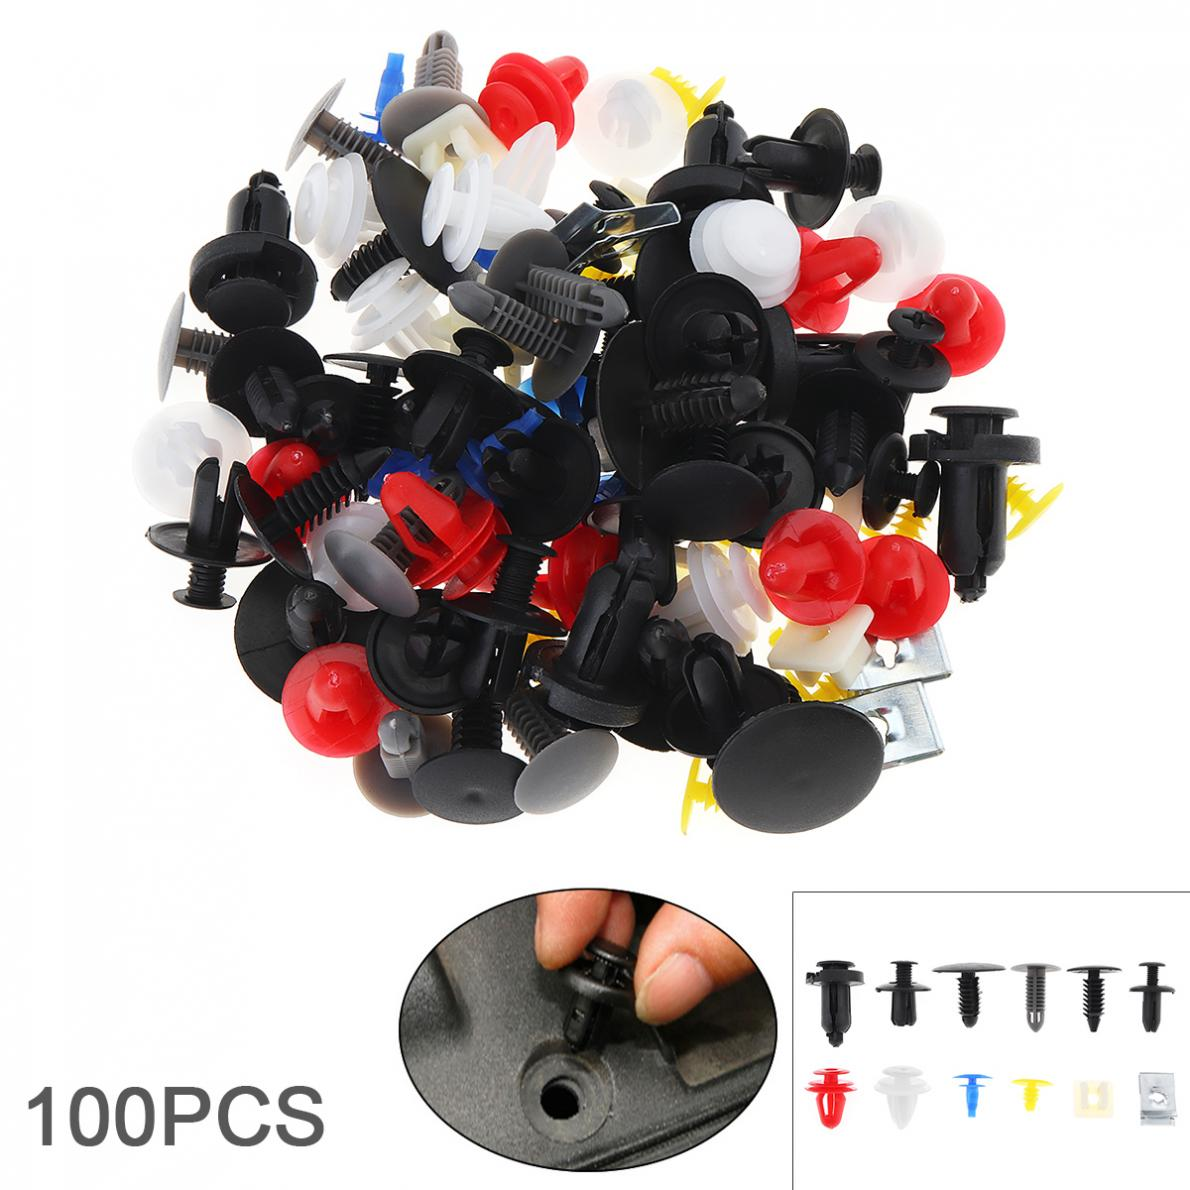 100 unids/set 12 tipos Universal de plástico cuerpo de Metal coche parachoques empuje Pin Clip remaches Kit de tornillos de expansión